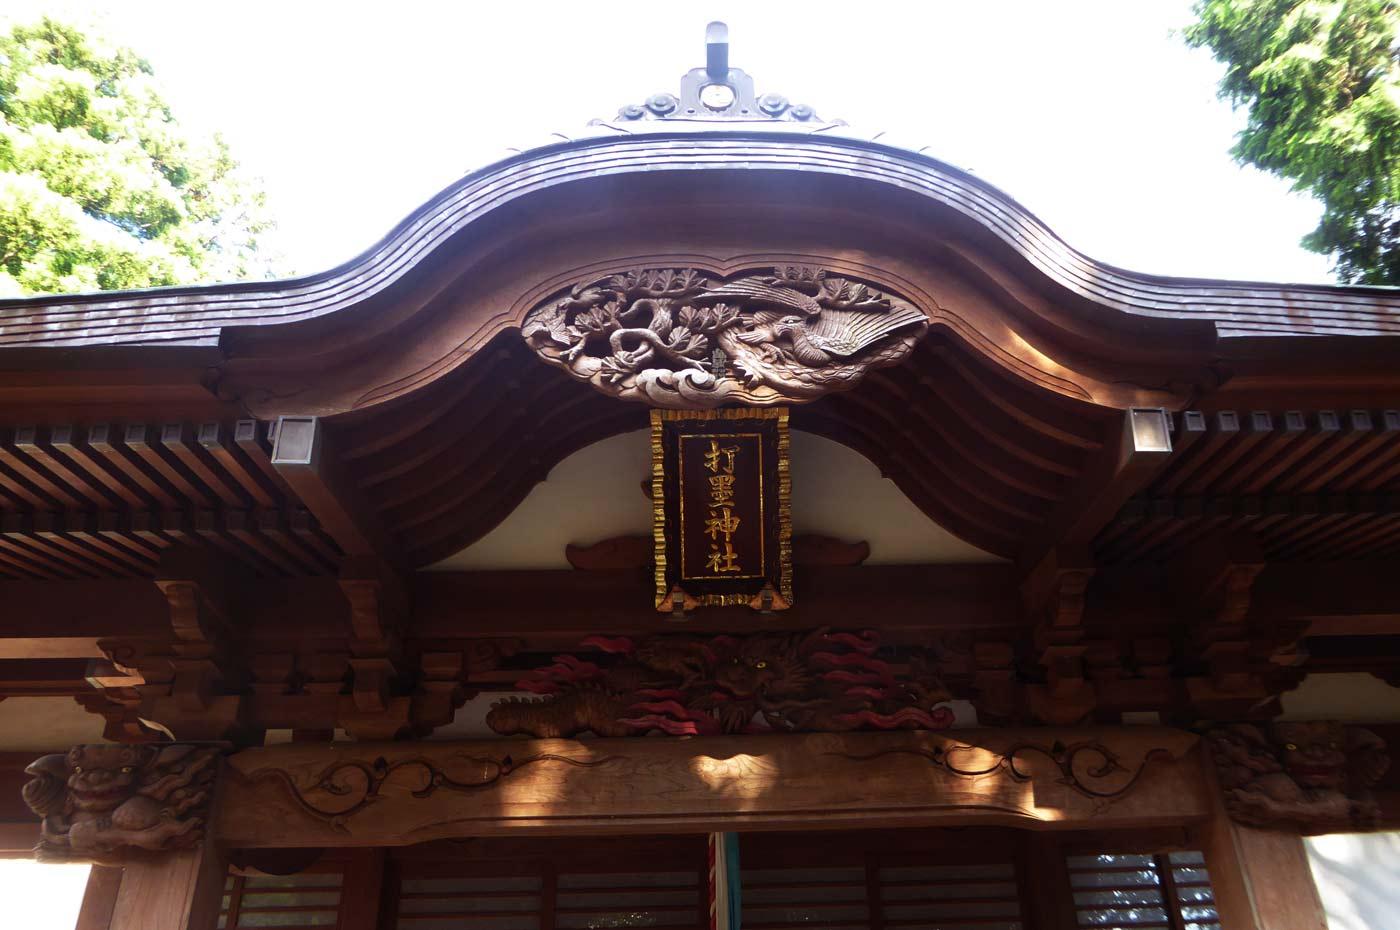 打墨神社向拝の彫刻